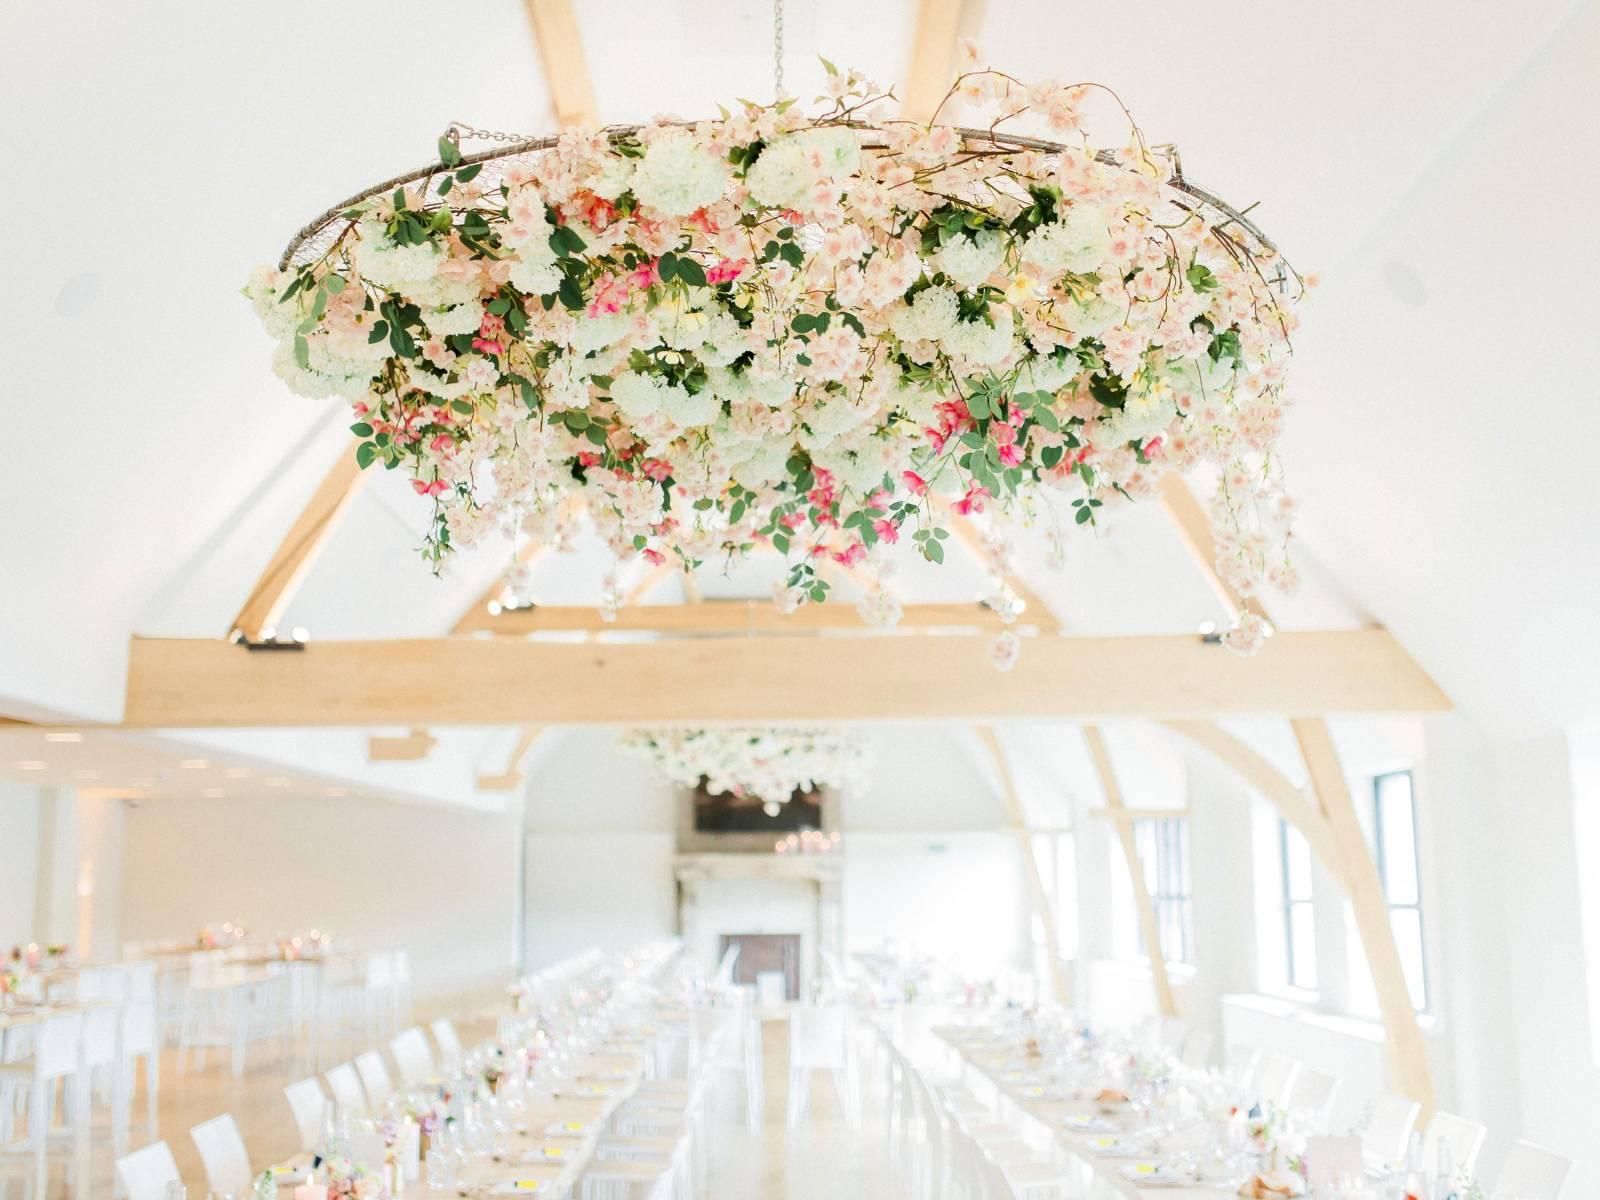 Maison Julie - Bruidsboeket - Bloemen huwelijk trouw bruiloft - Kelly & Jonas - Long Story Short - House of Weddings - 24